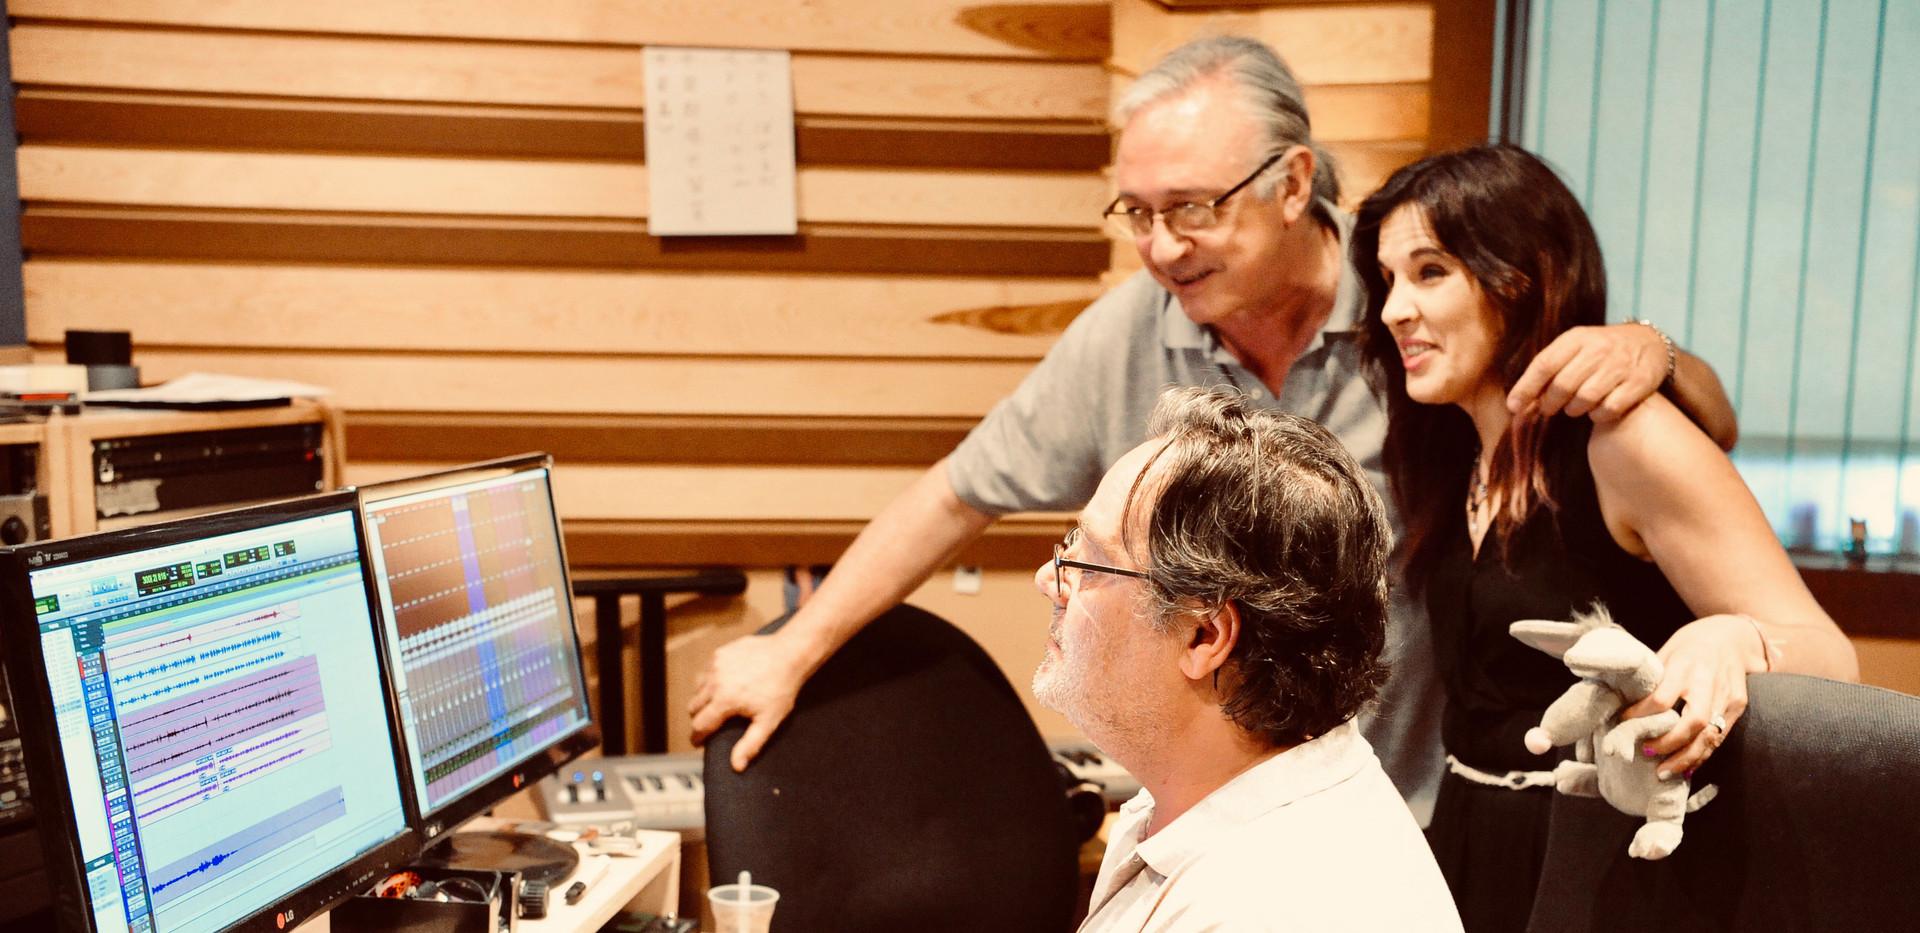 Pablo Baselga ı Richie Ferrer ı Loly Ayuma